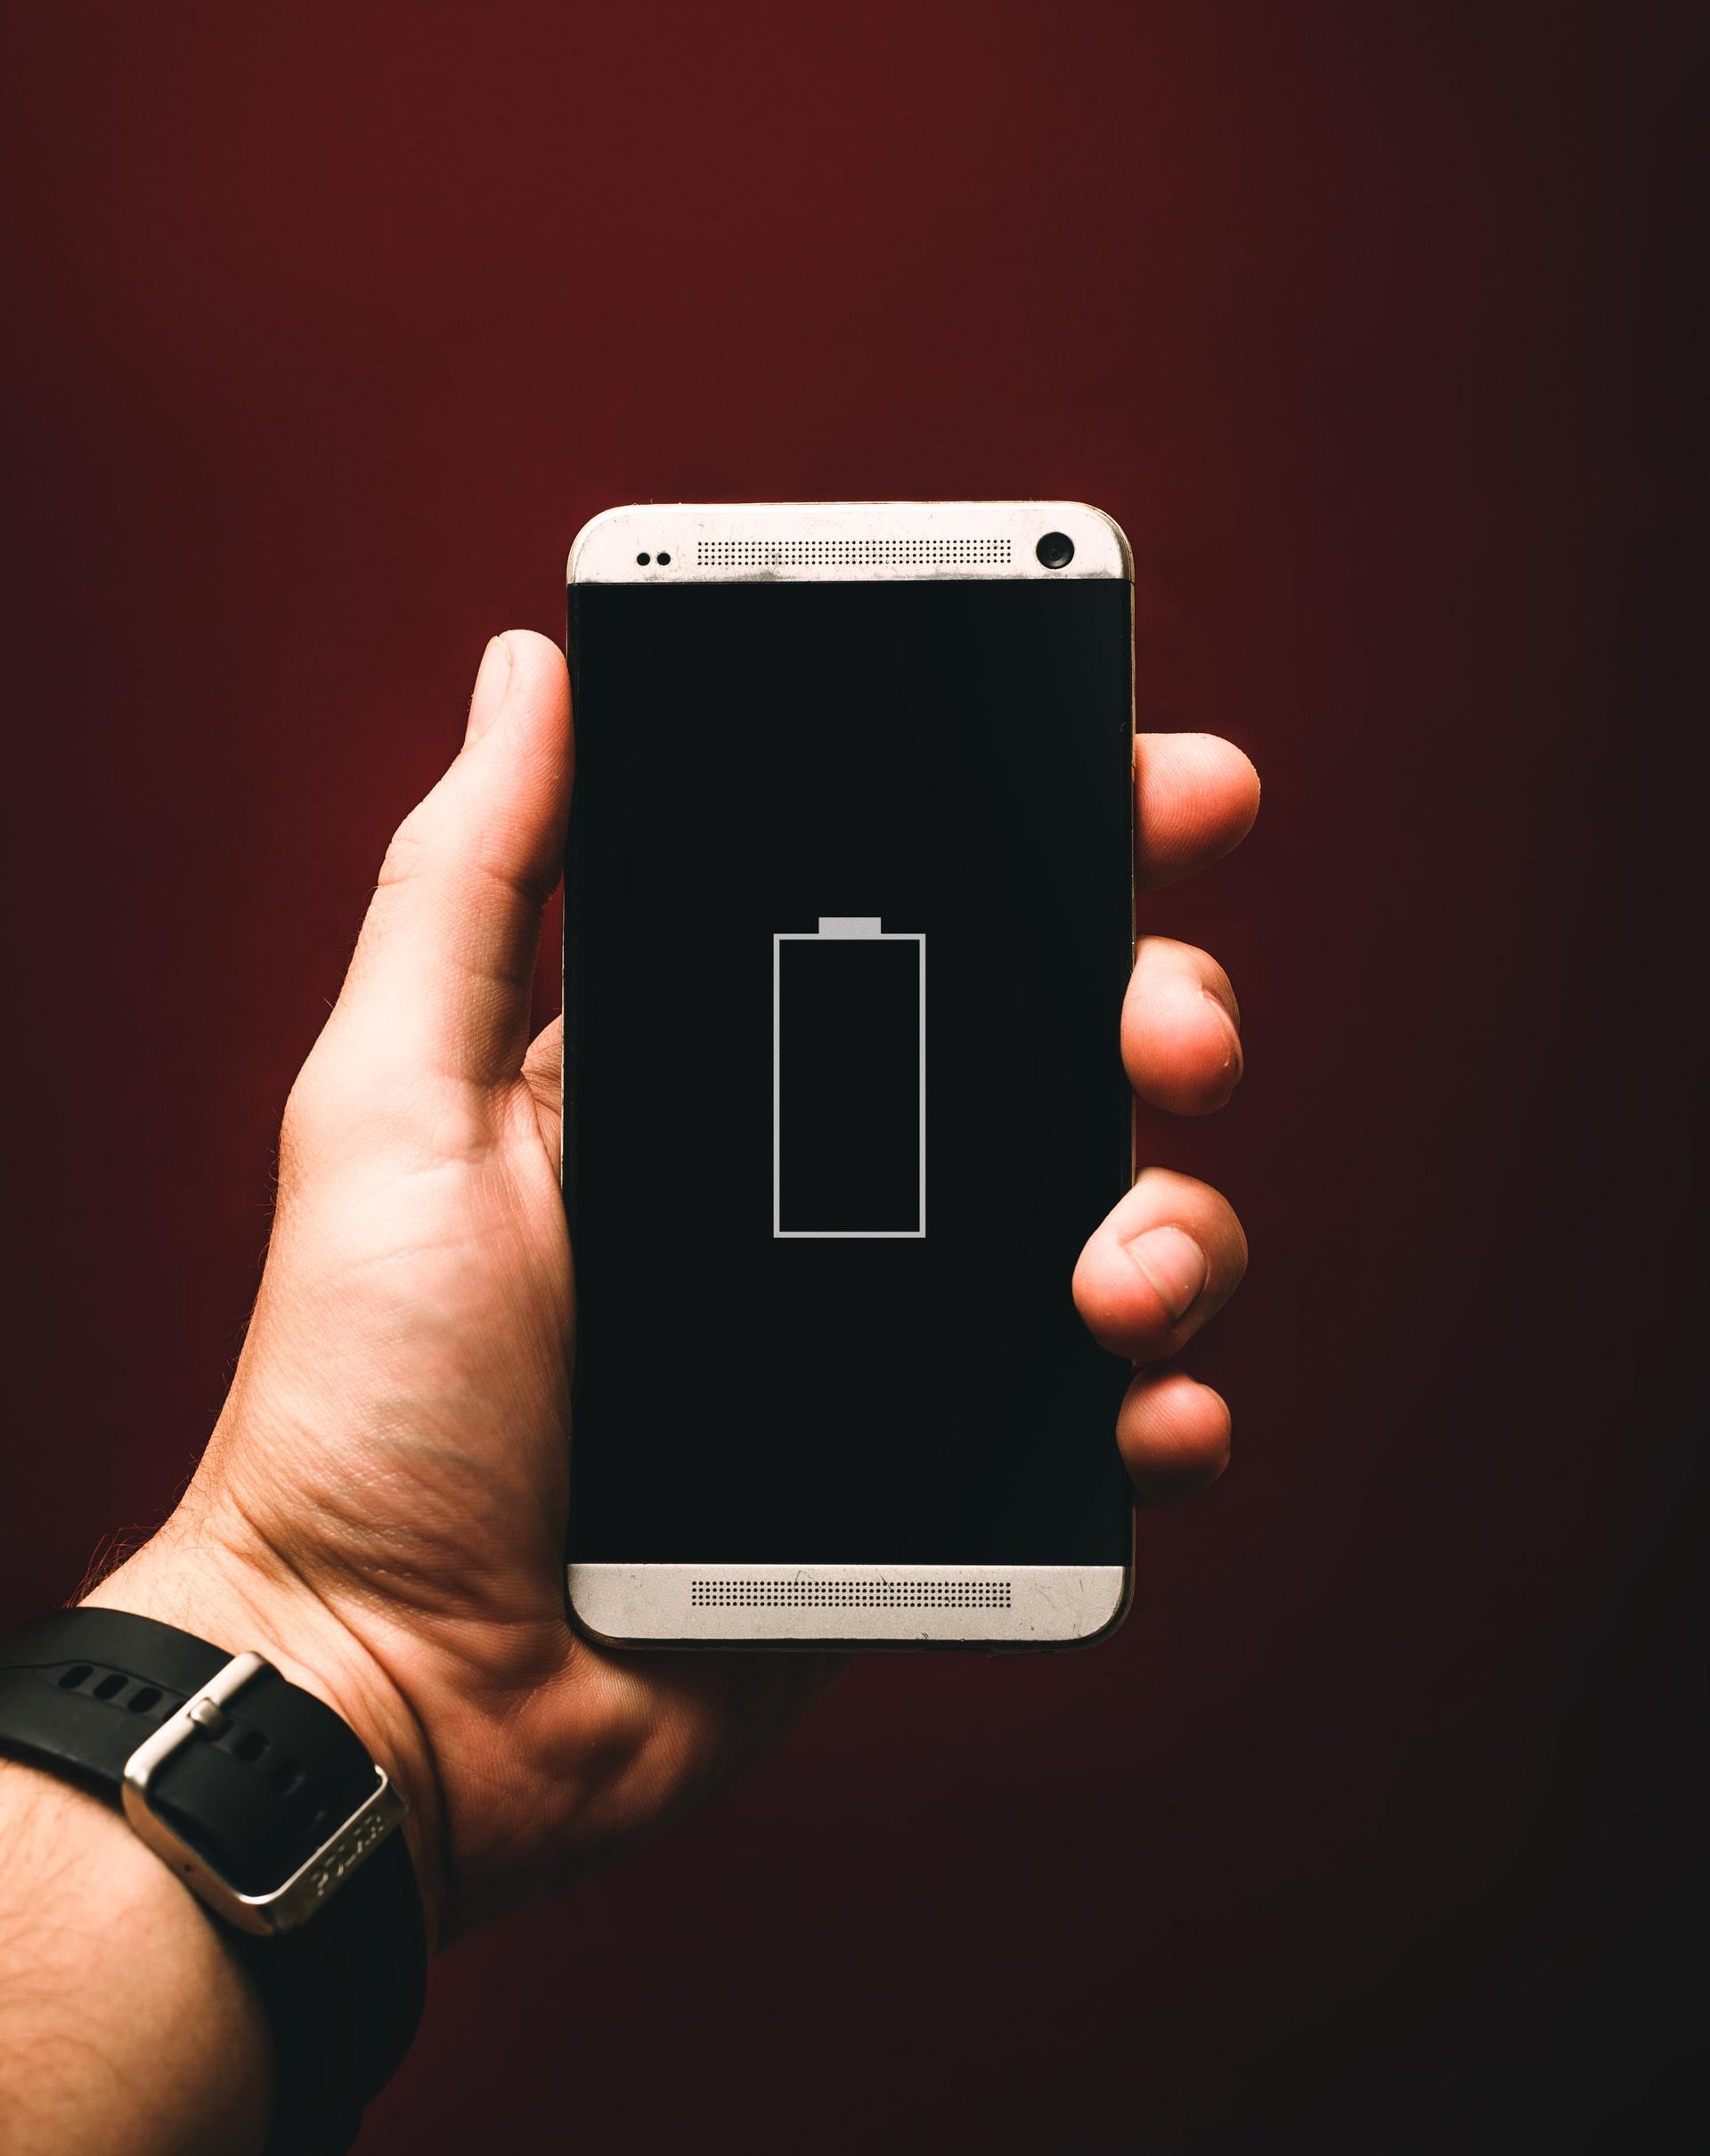 4-cara-mengatasi-baterai-ponsel-tiba-tiba-1